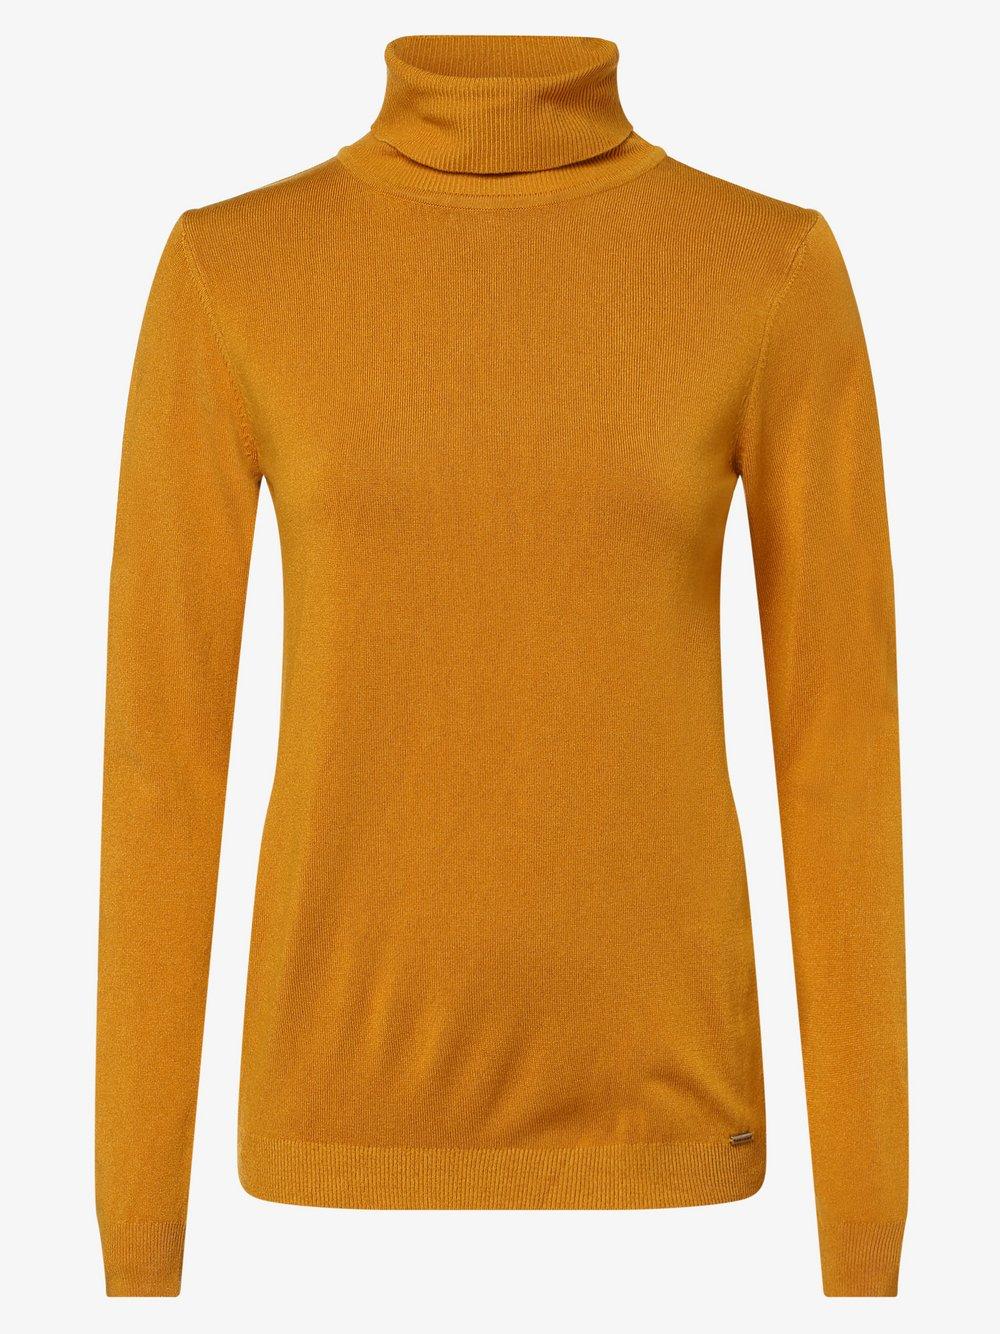 More & More - Sweter damski, żółty